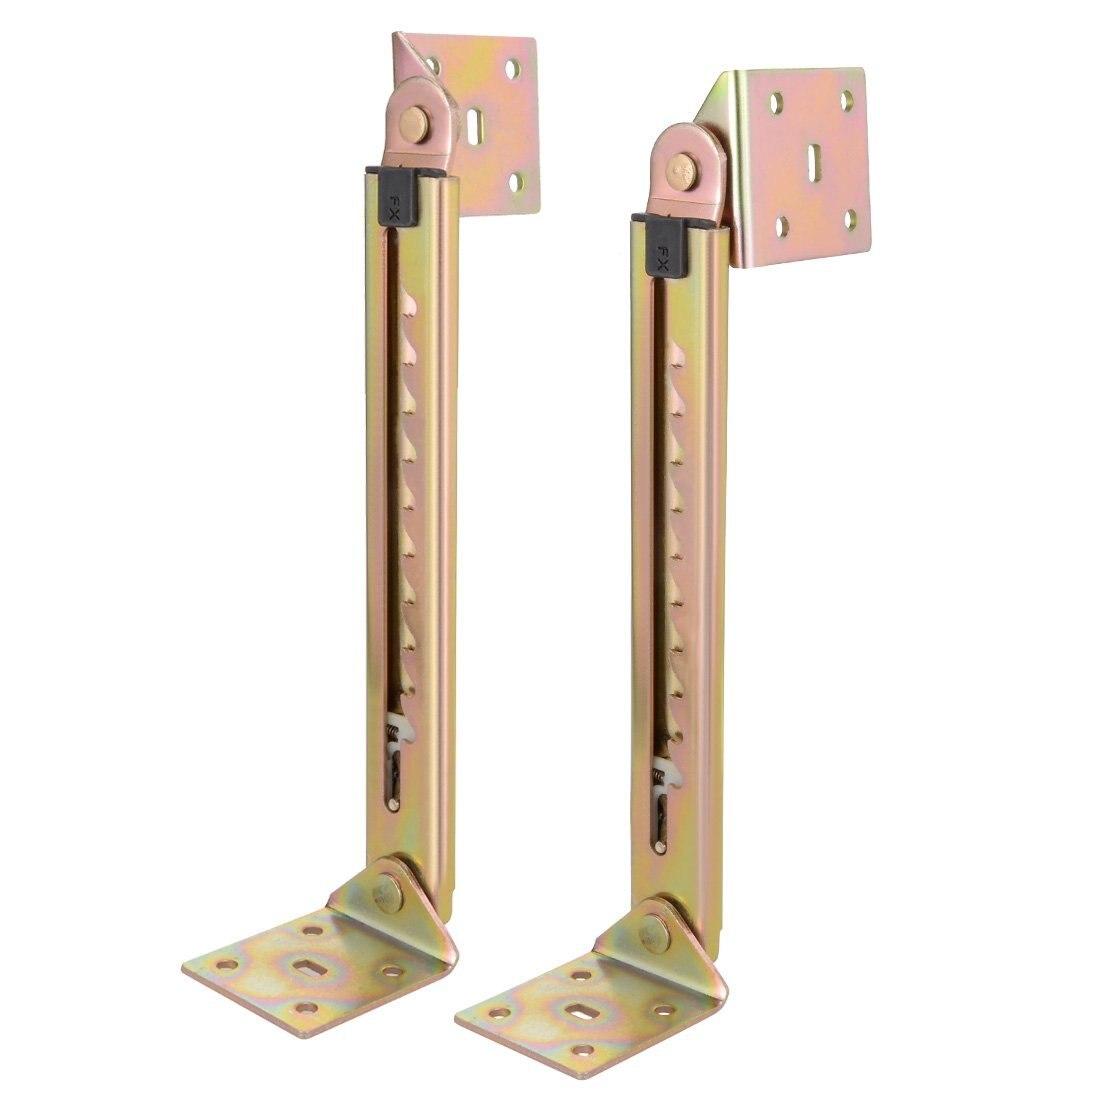 1 Pair Angle Lifting Rod Desk 10 Gear Adjusting Hinge Angle Hinge With Bracket